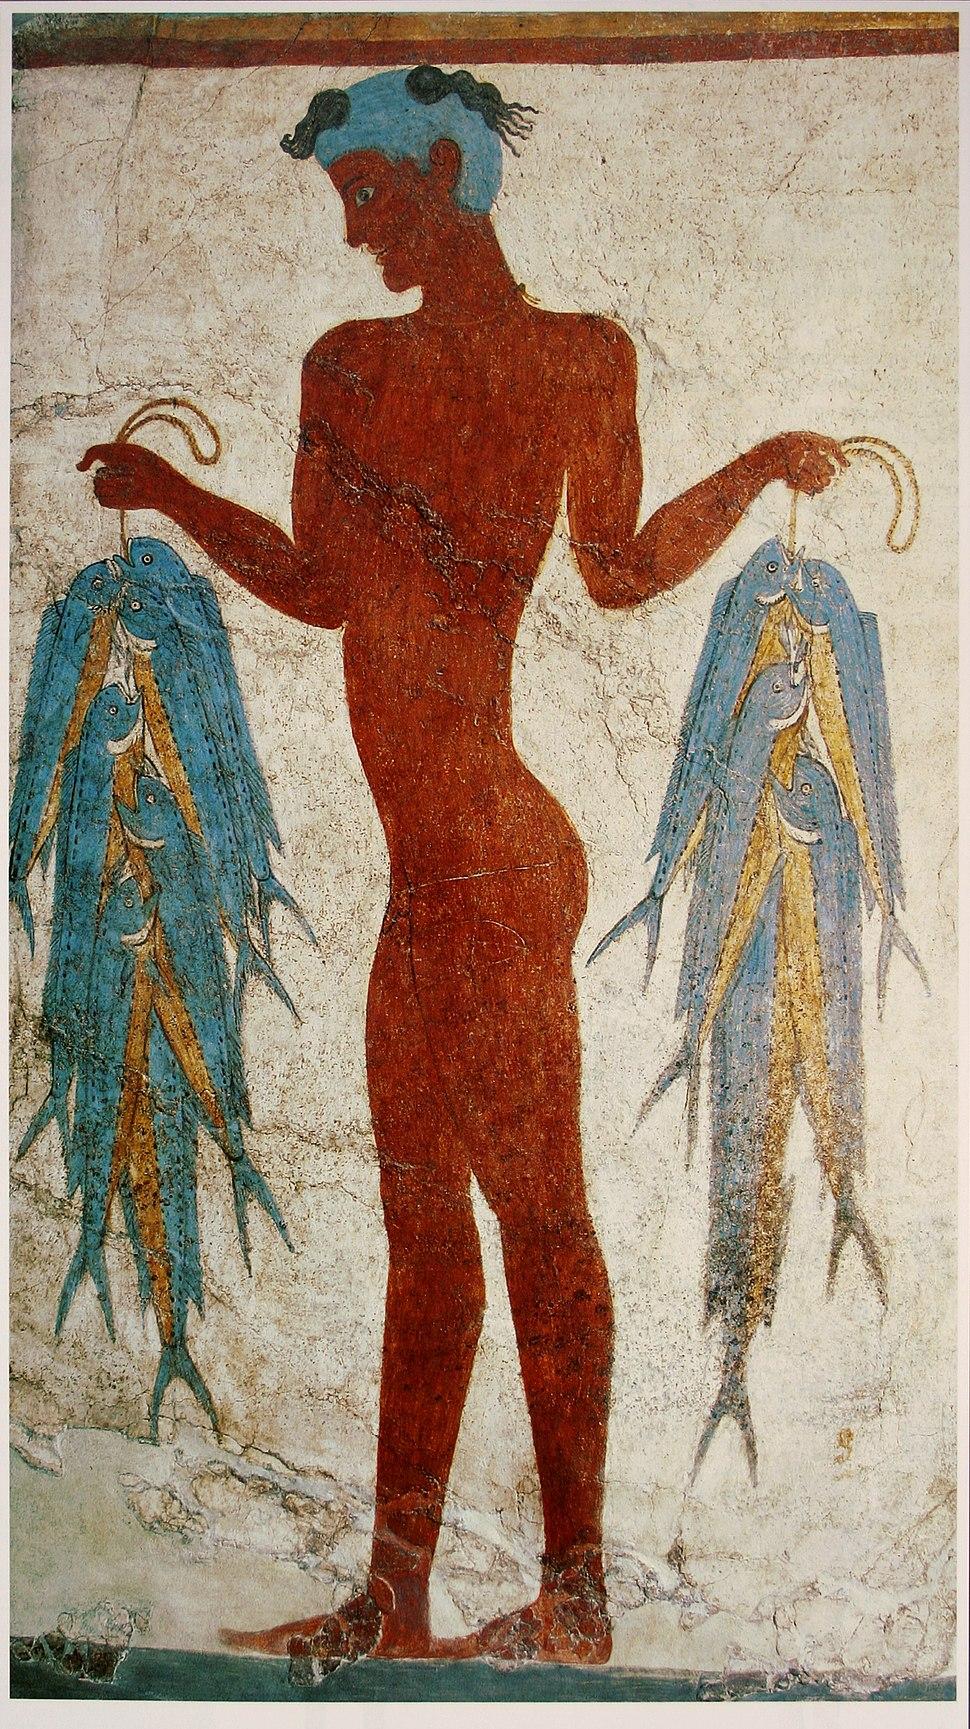 Fresco of a fisherman, Akrotiri, Greece